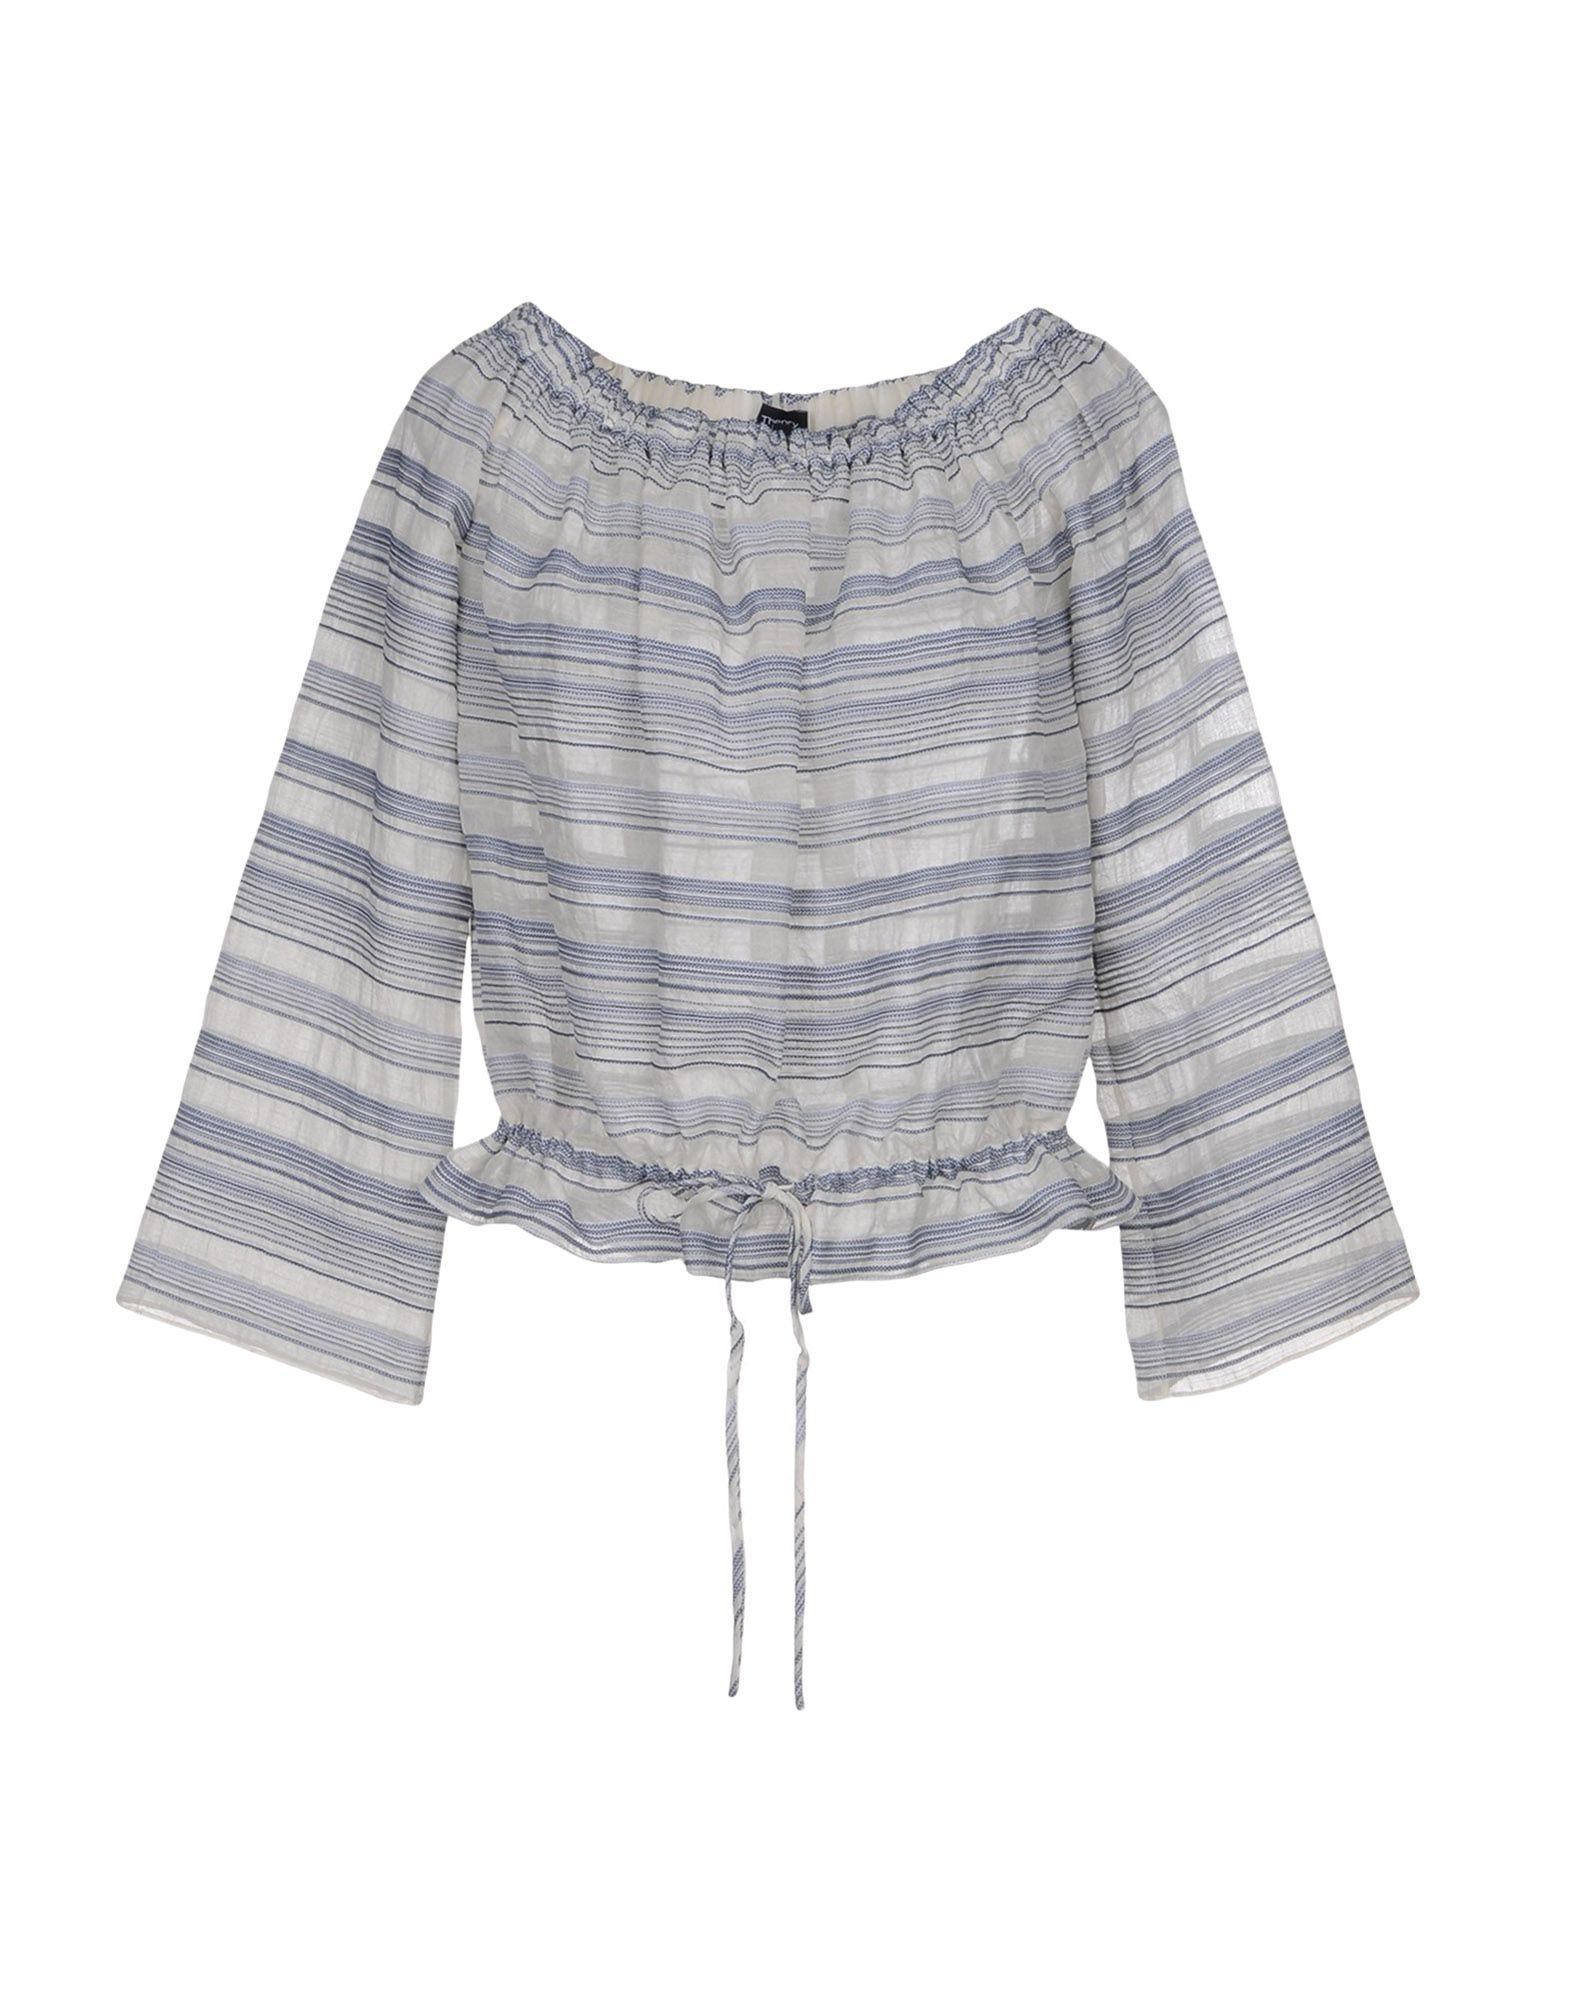 THEORY Блузка блузка в полоску marice